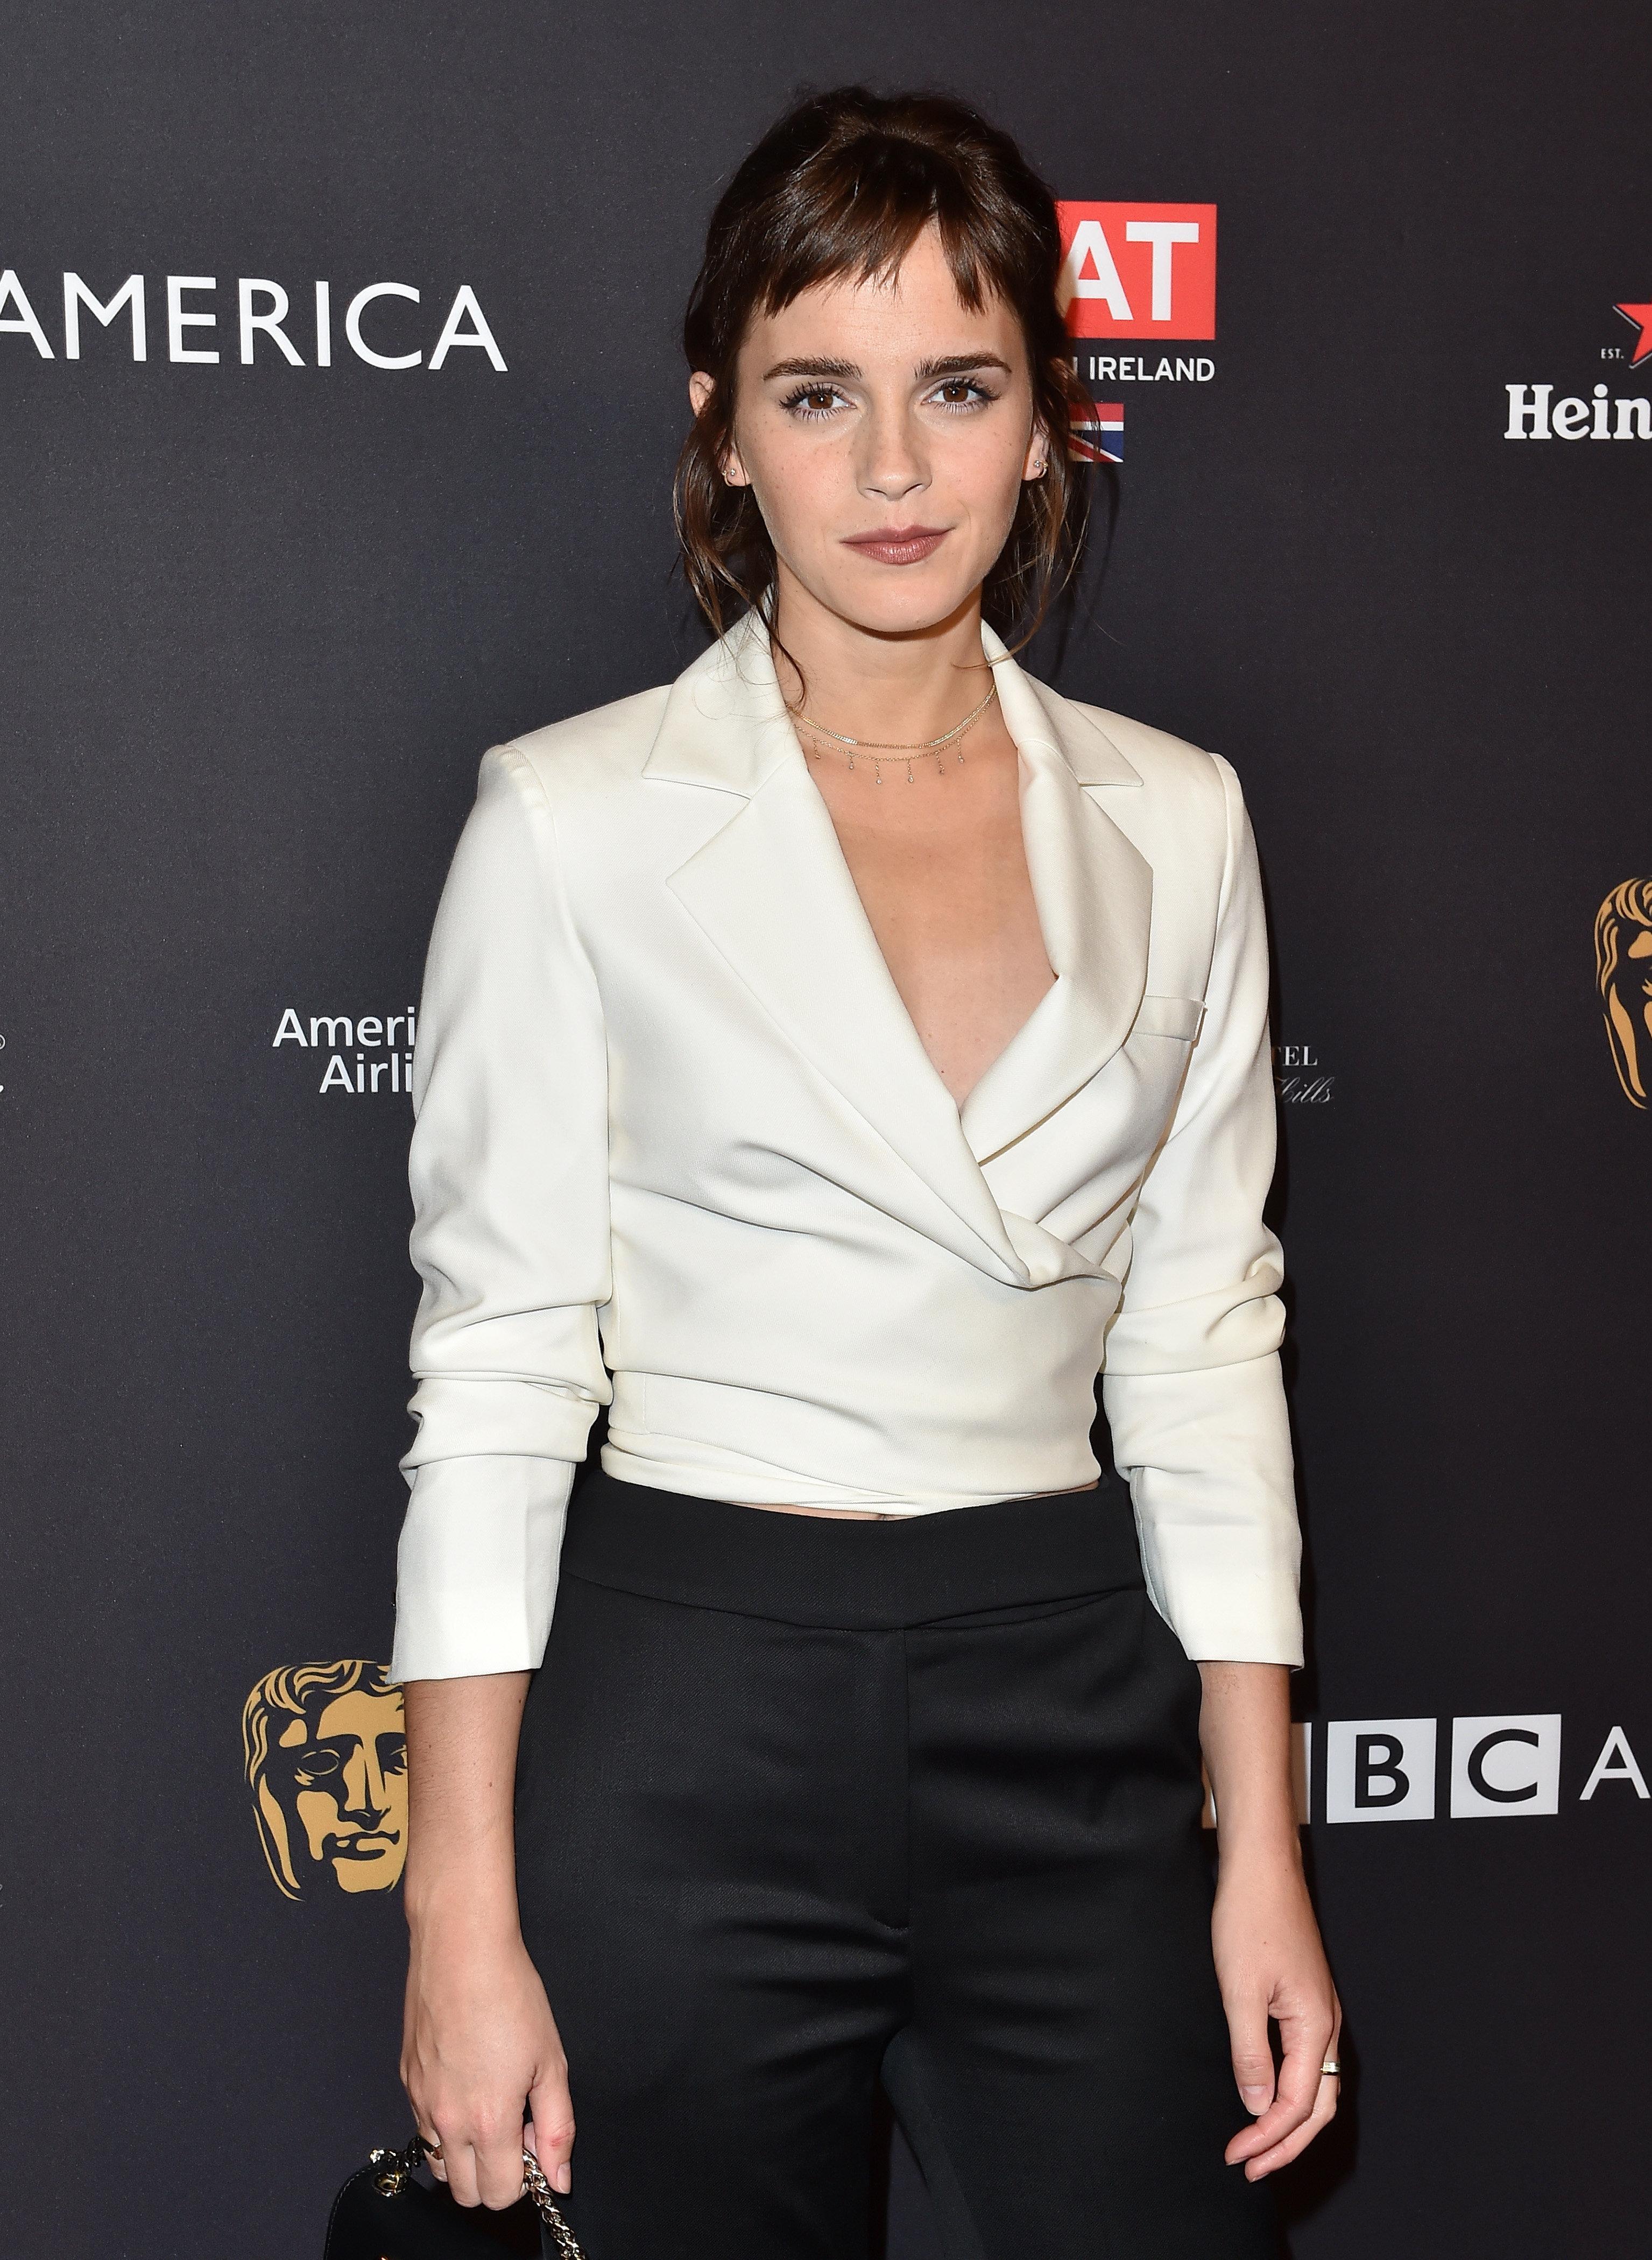 Emma Watson Donates £1 Million As British Stars Back 'Time's Up' Ahead Of Baftas